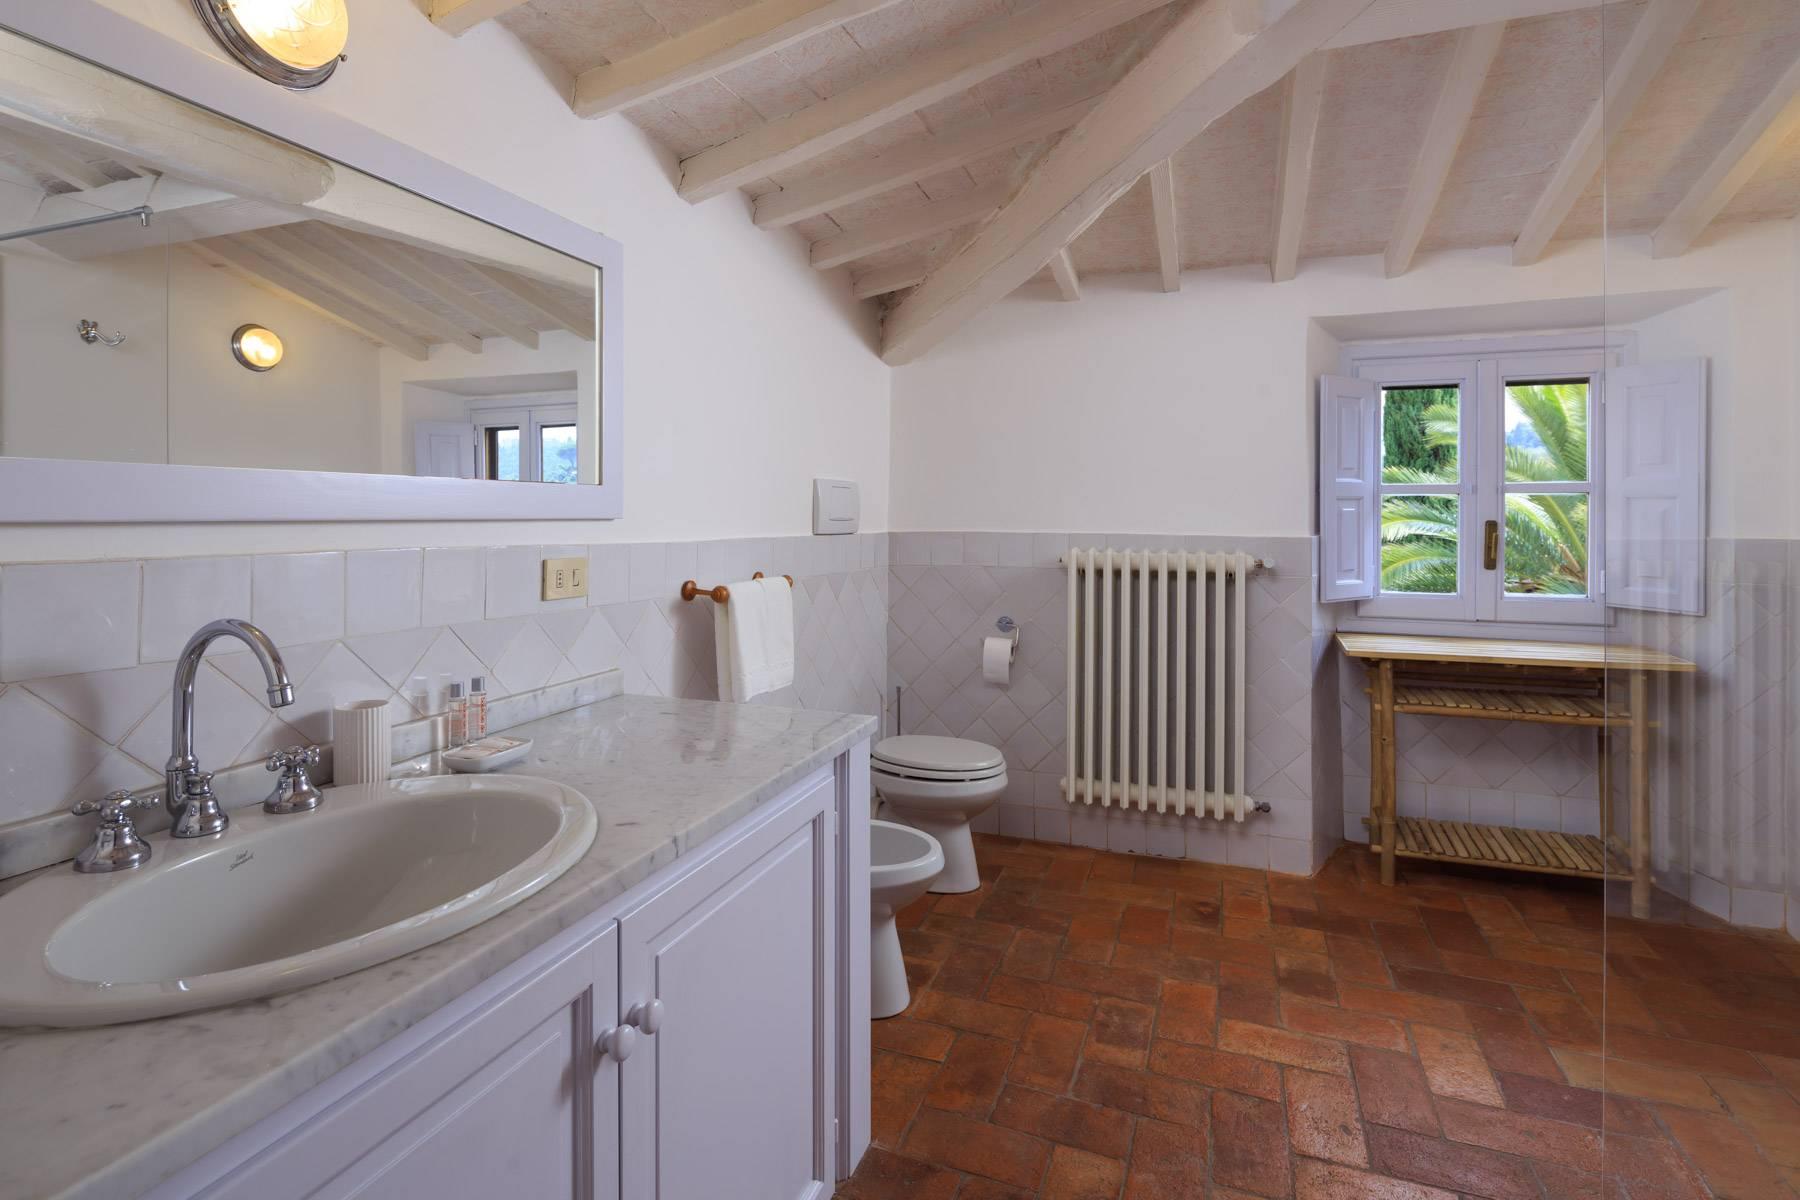 Villa in Affitto a Firenze: 5 locali, 600 mq - Foto 30